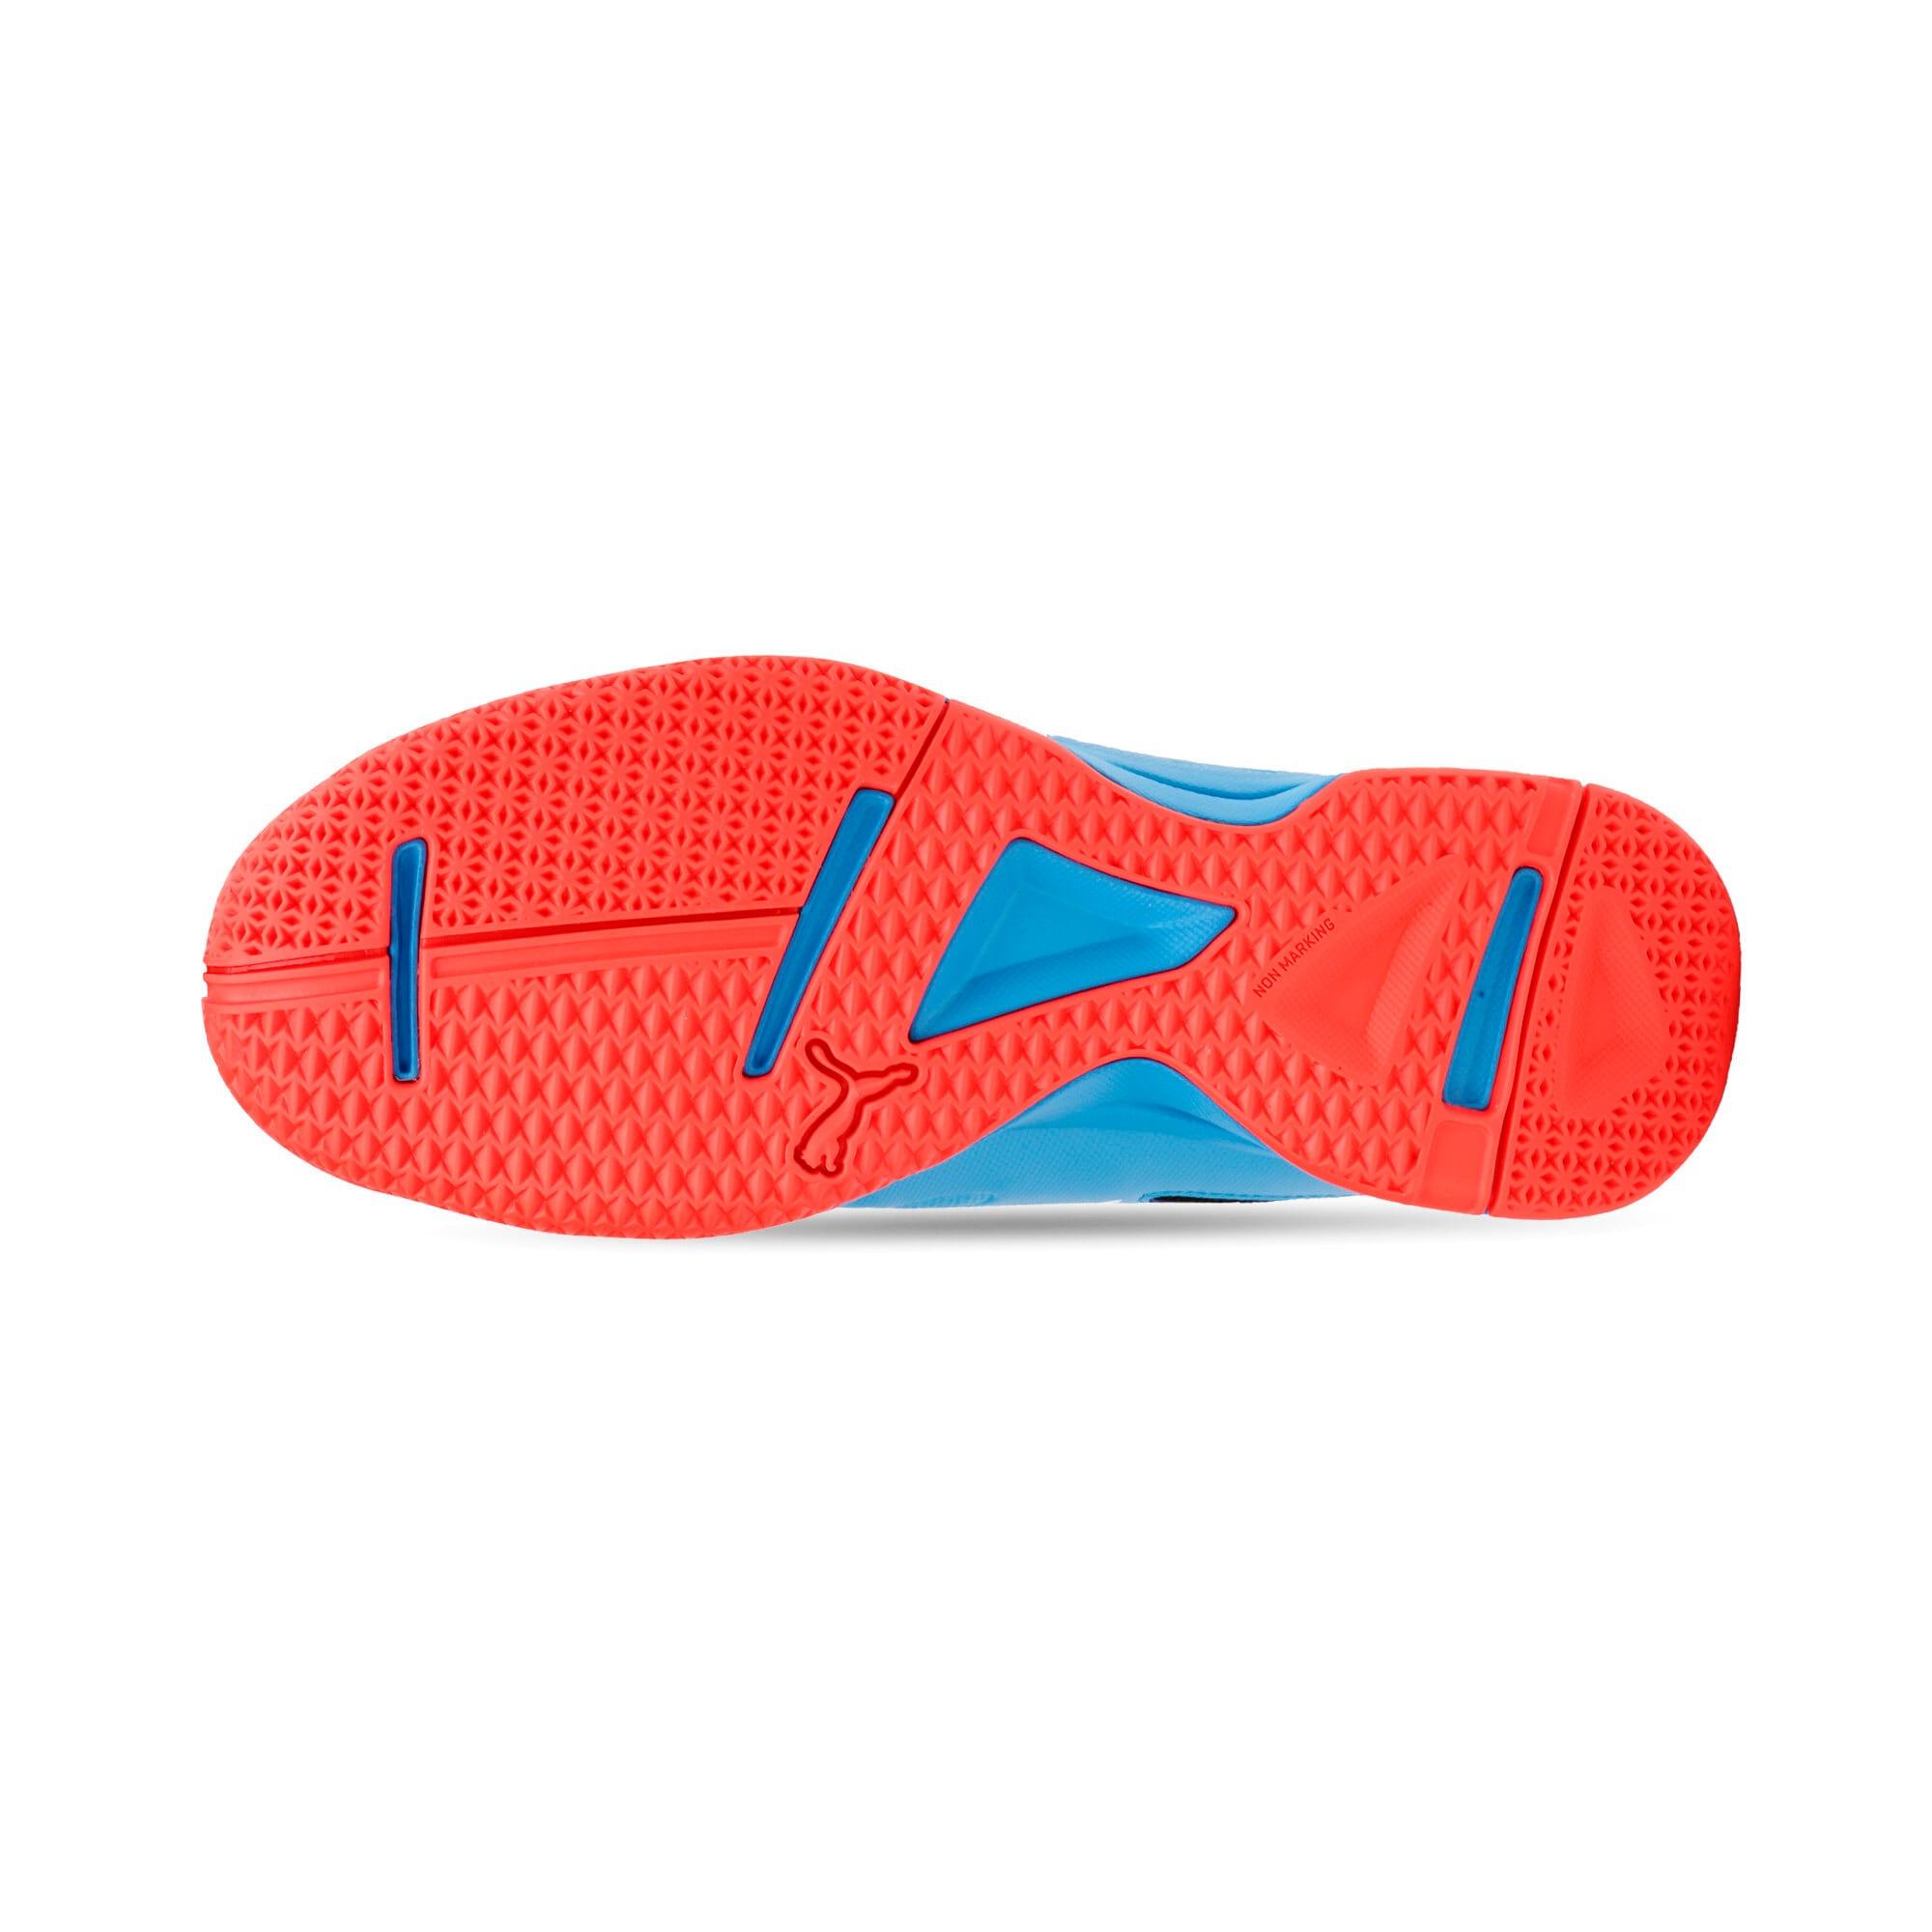 Thumbnail 4 of Tenaz Kids' Indoor Teamsport Shoes, Bleu Azur-White-Black-Red, medium-IND